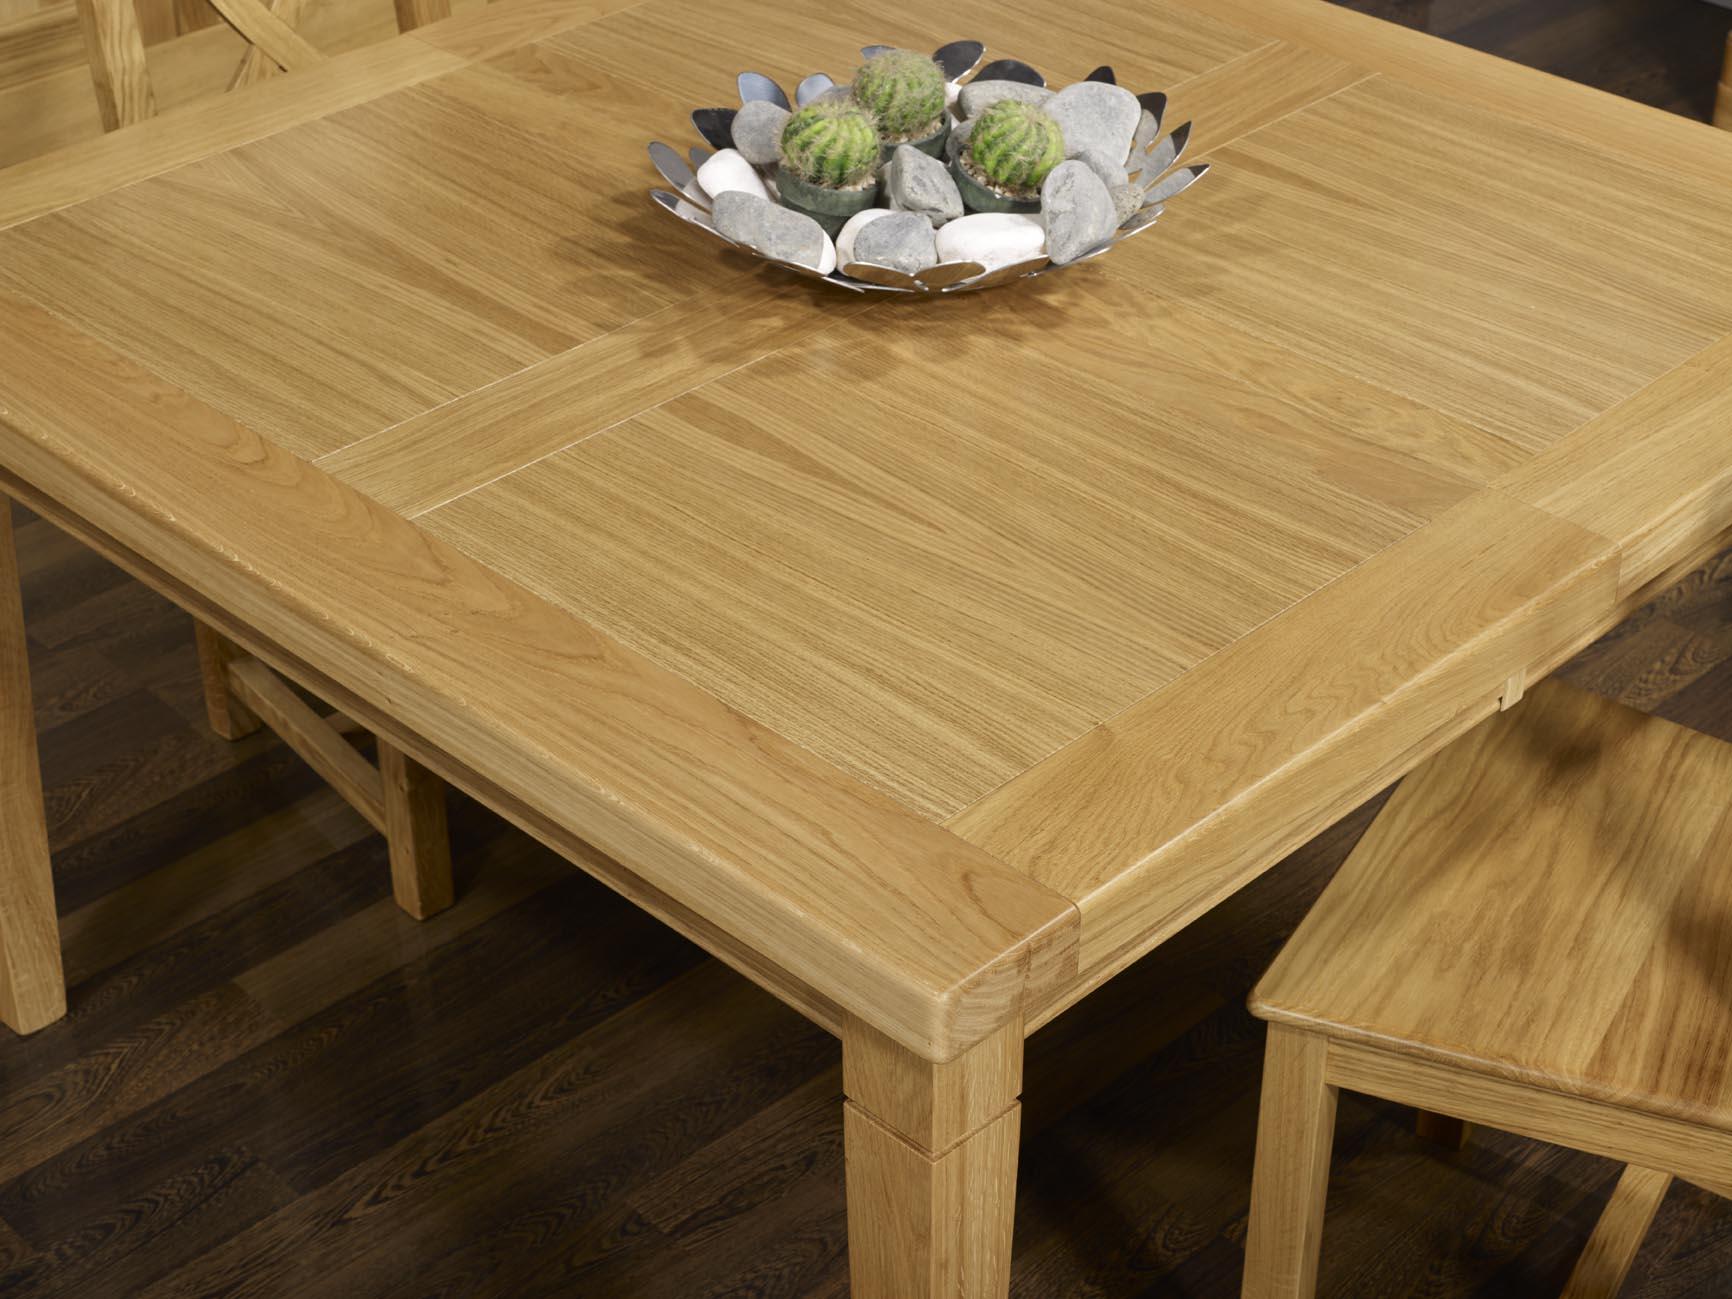 table de repas carr e en ch ne massif 140x140 pieds. Black Bedroom Furniture Sets. Home Design Ideas